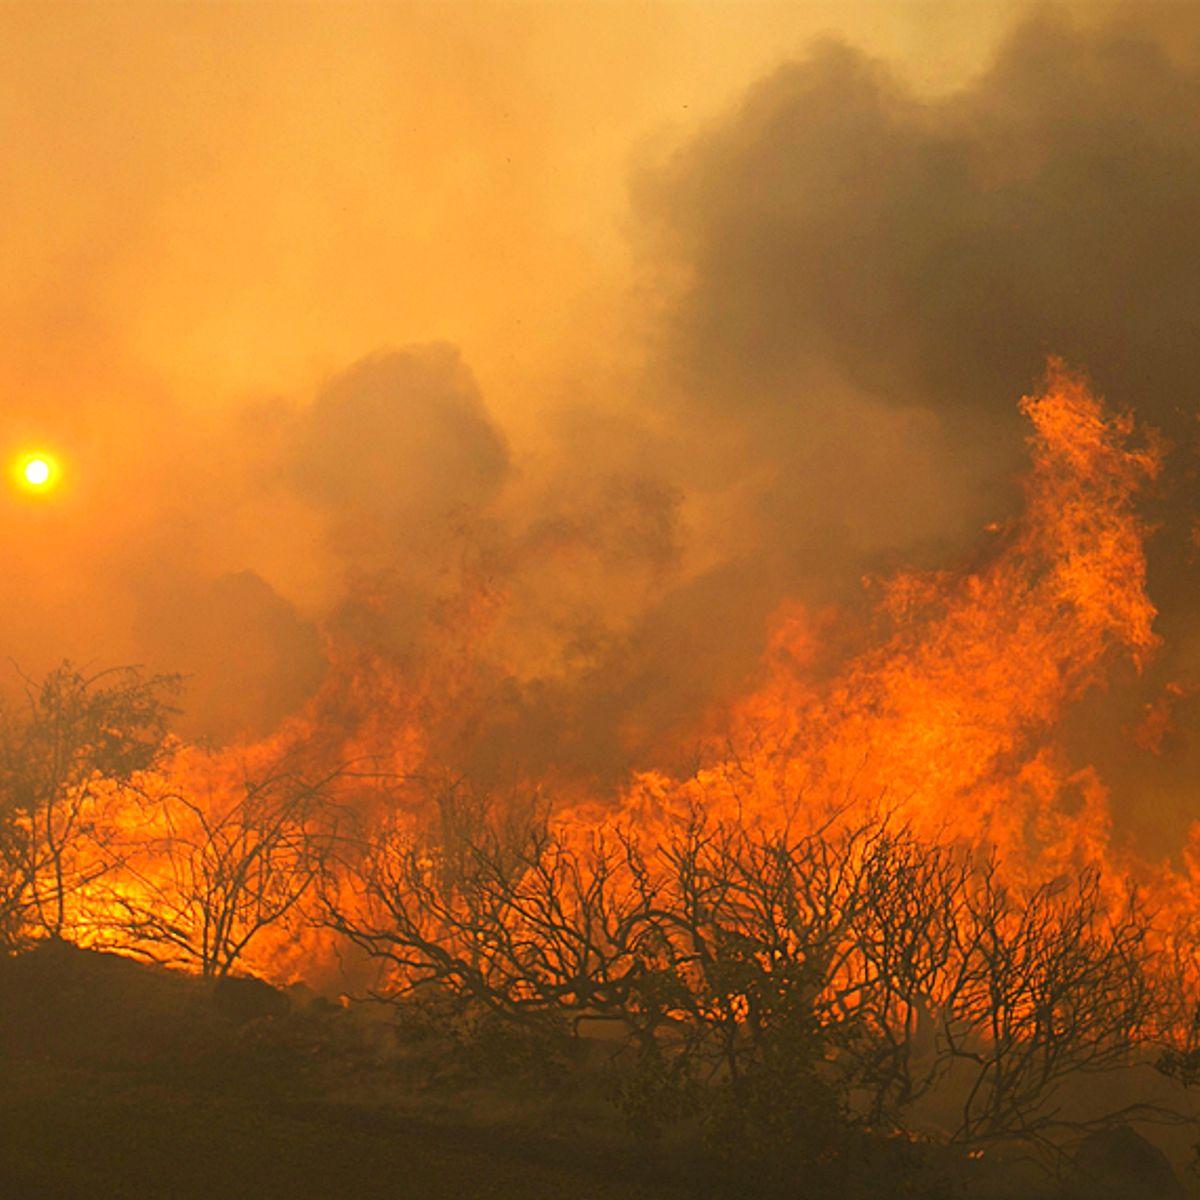 Elizabeth Warren's new climate plan uses wildfire wisdom from tribes